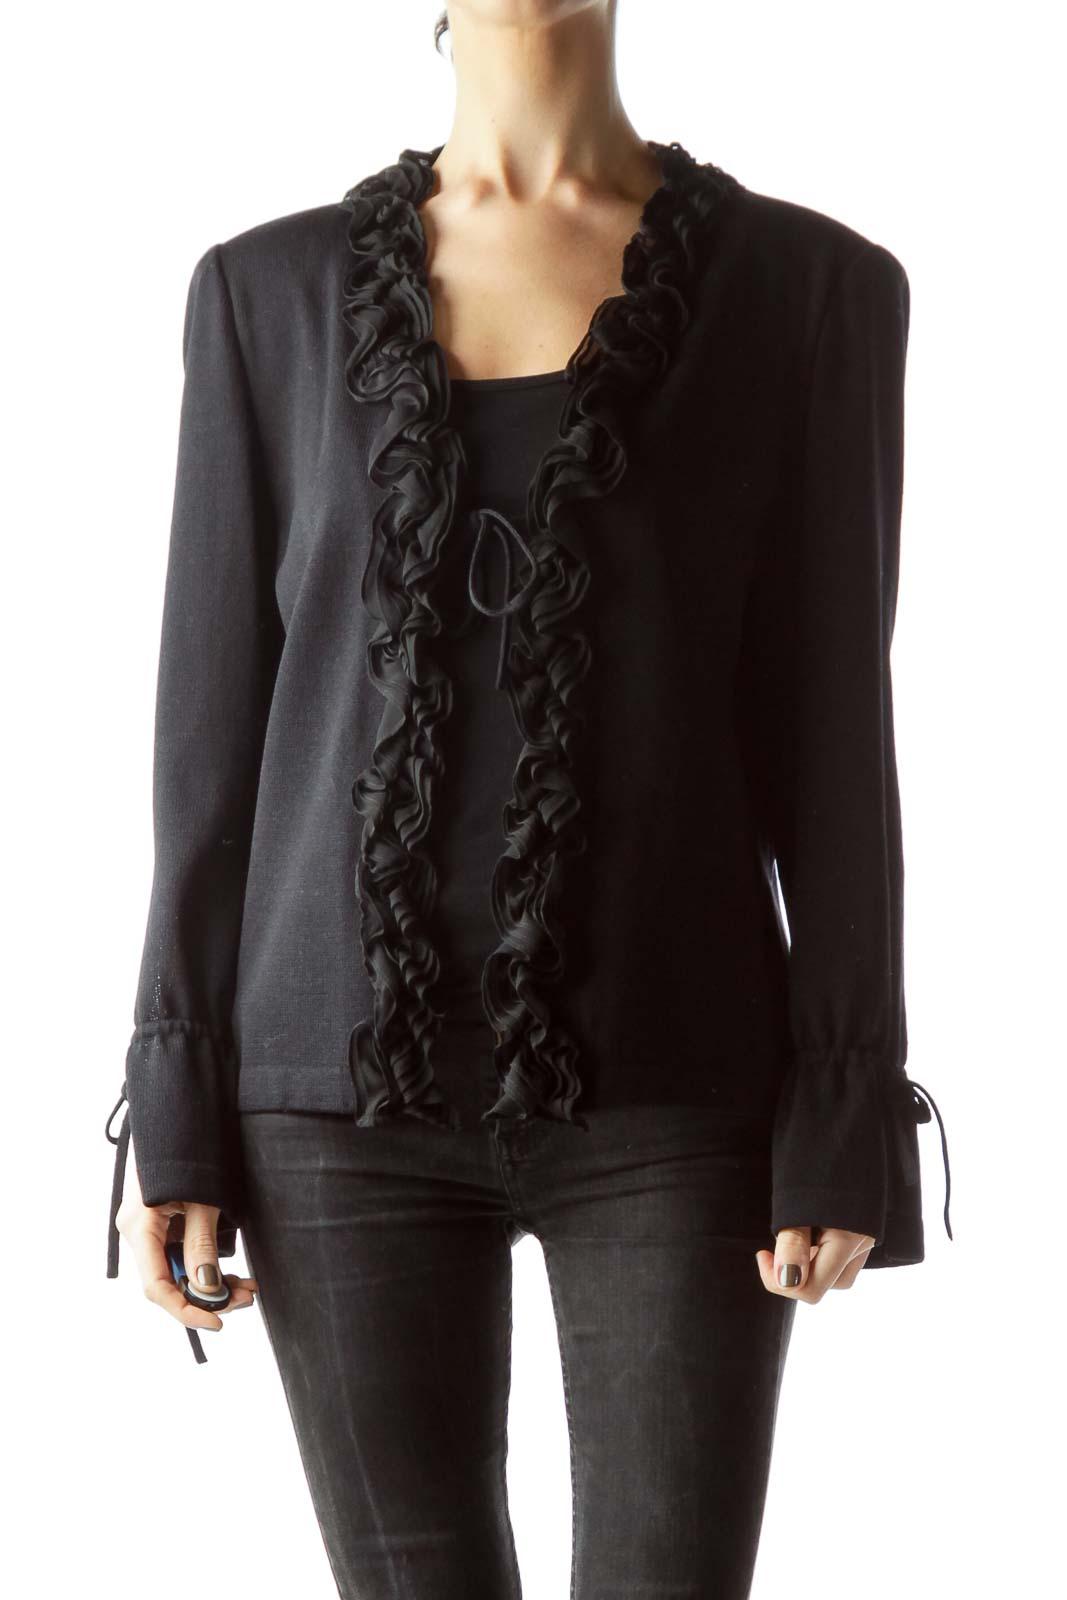 Black Ruffled Long Sleeve Knit Cardigan Front